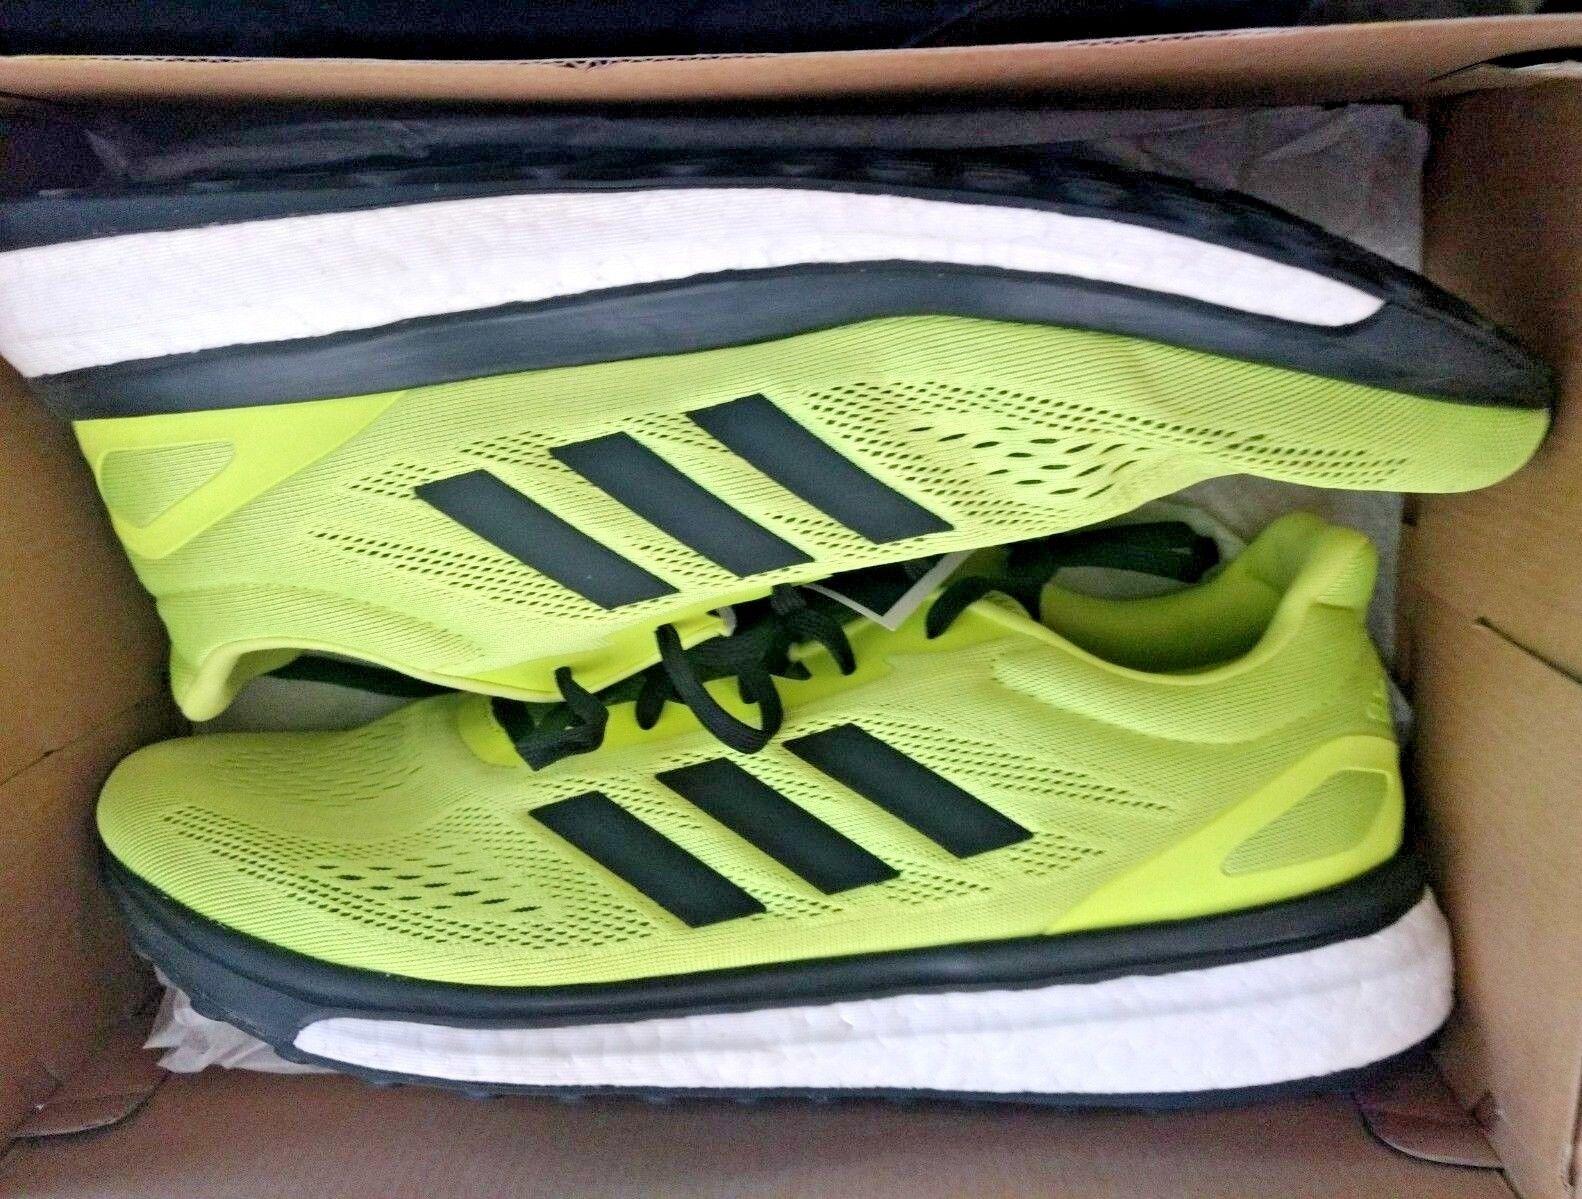 Men's Adidas Response LT Sonic Drive Running shoes Yellow Black White 11.5